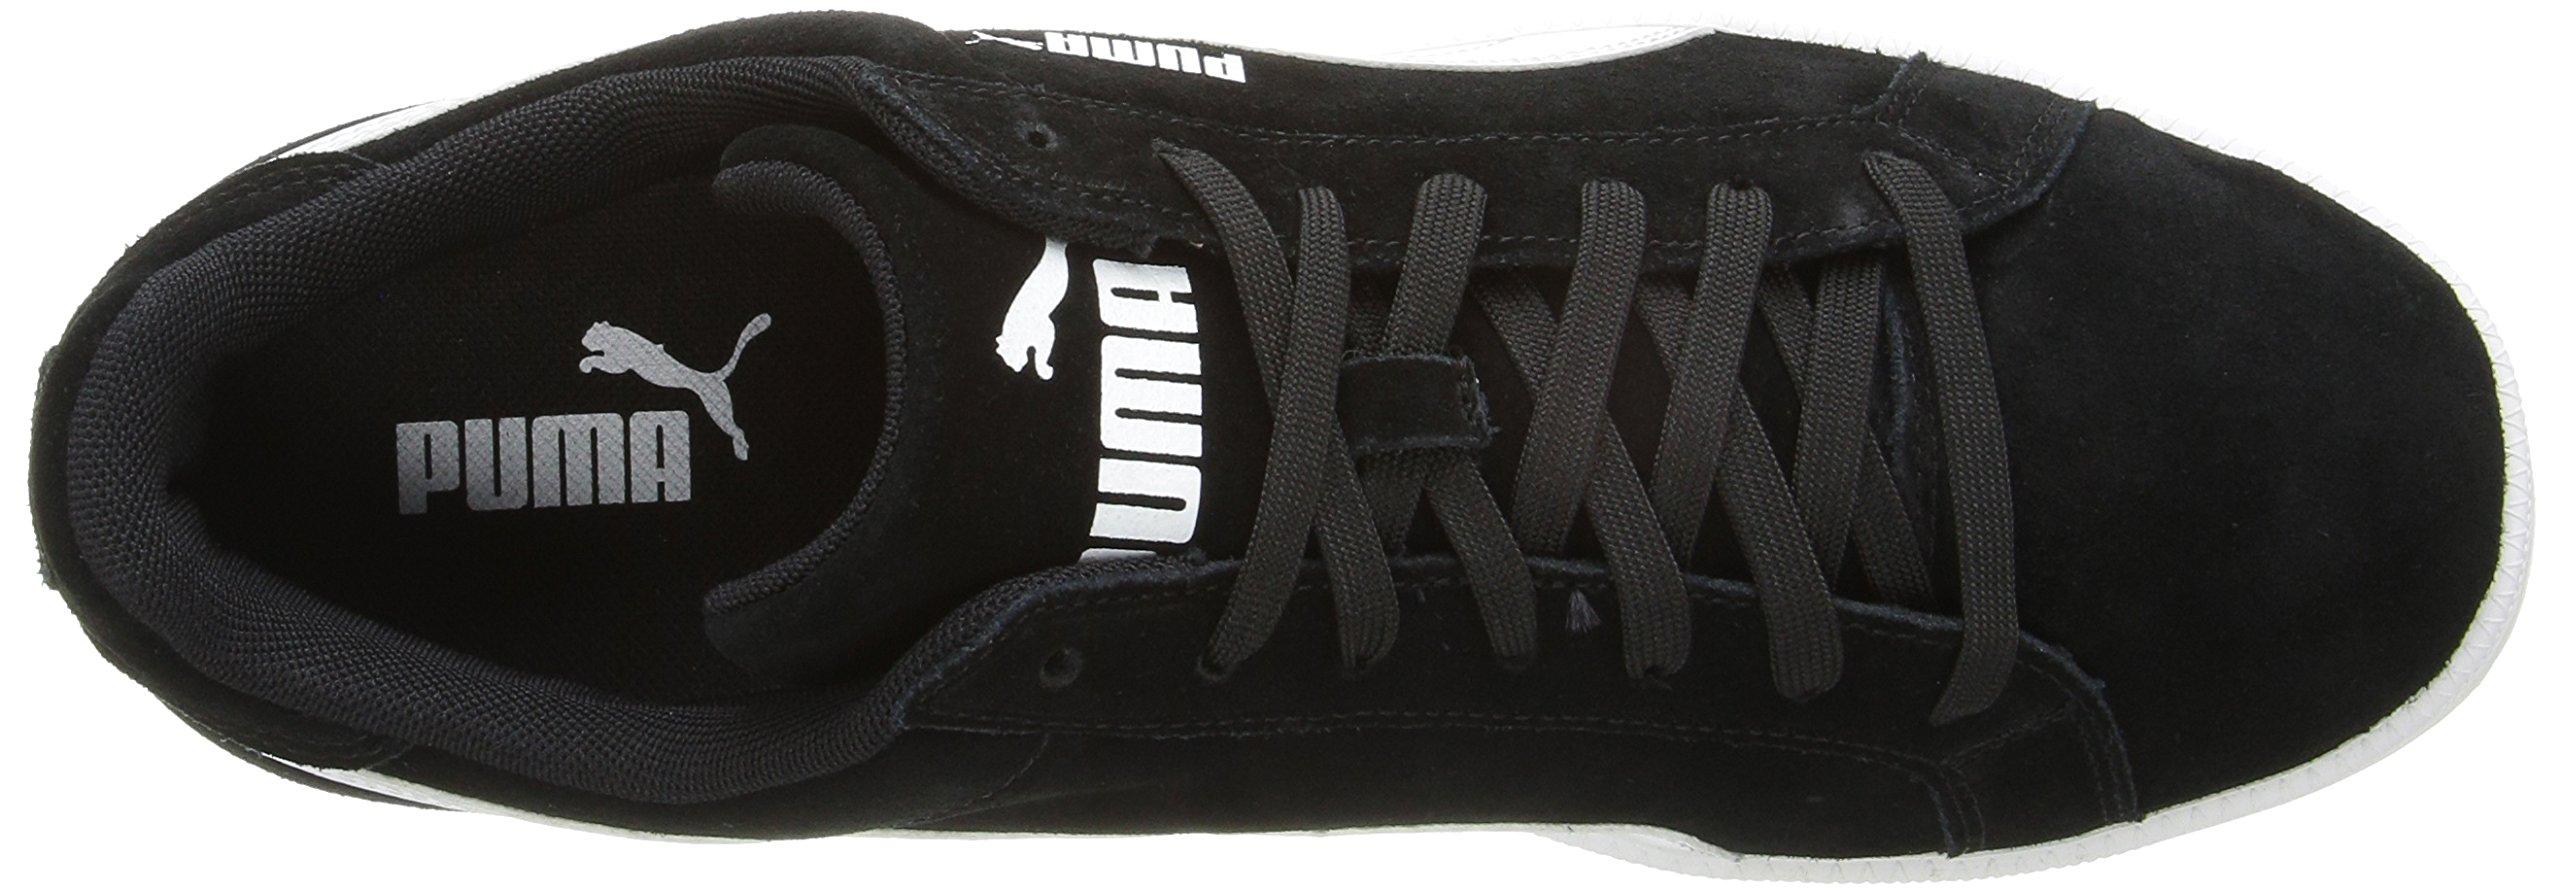 6881169bb6bb PUMA Men s Smash Suede Lthr Fashion Sneaker